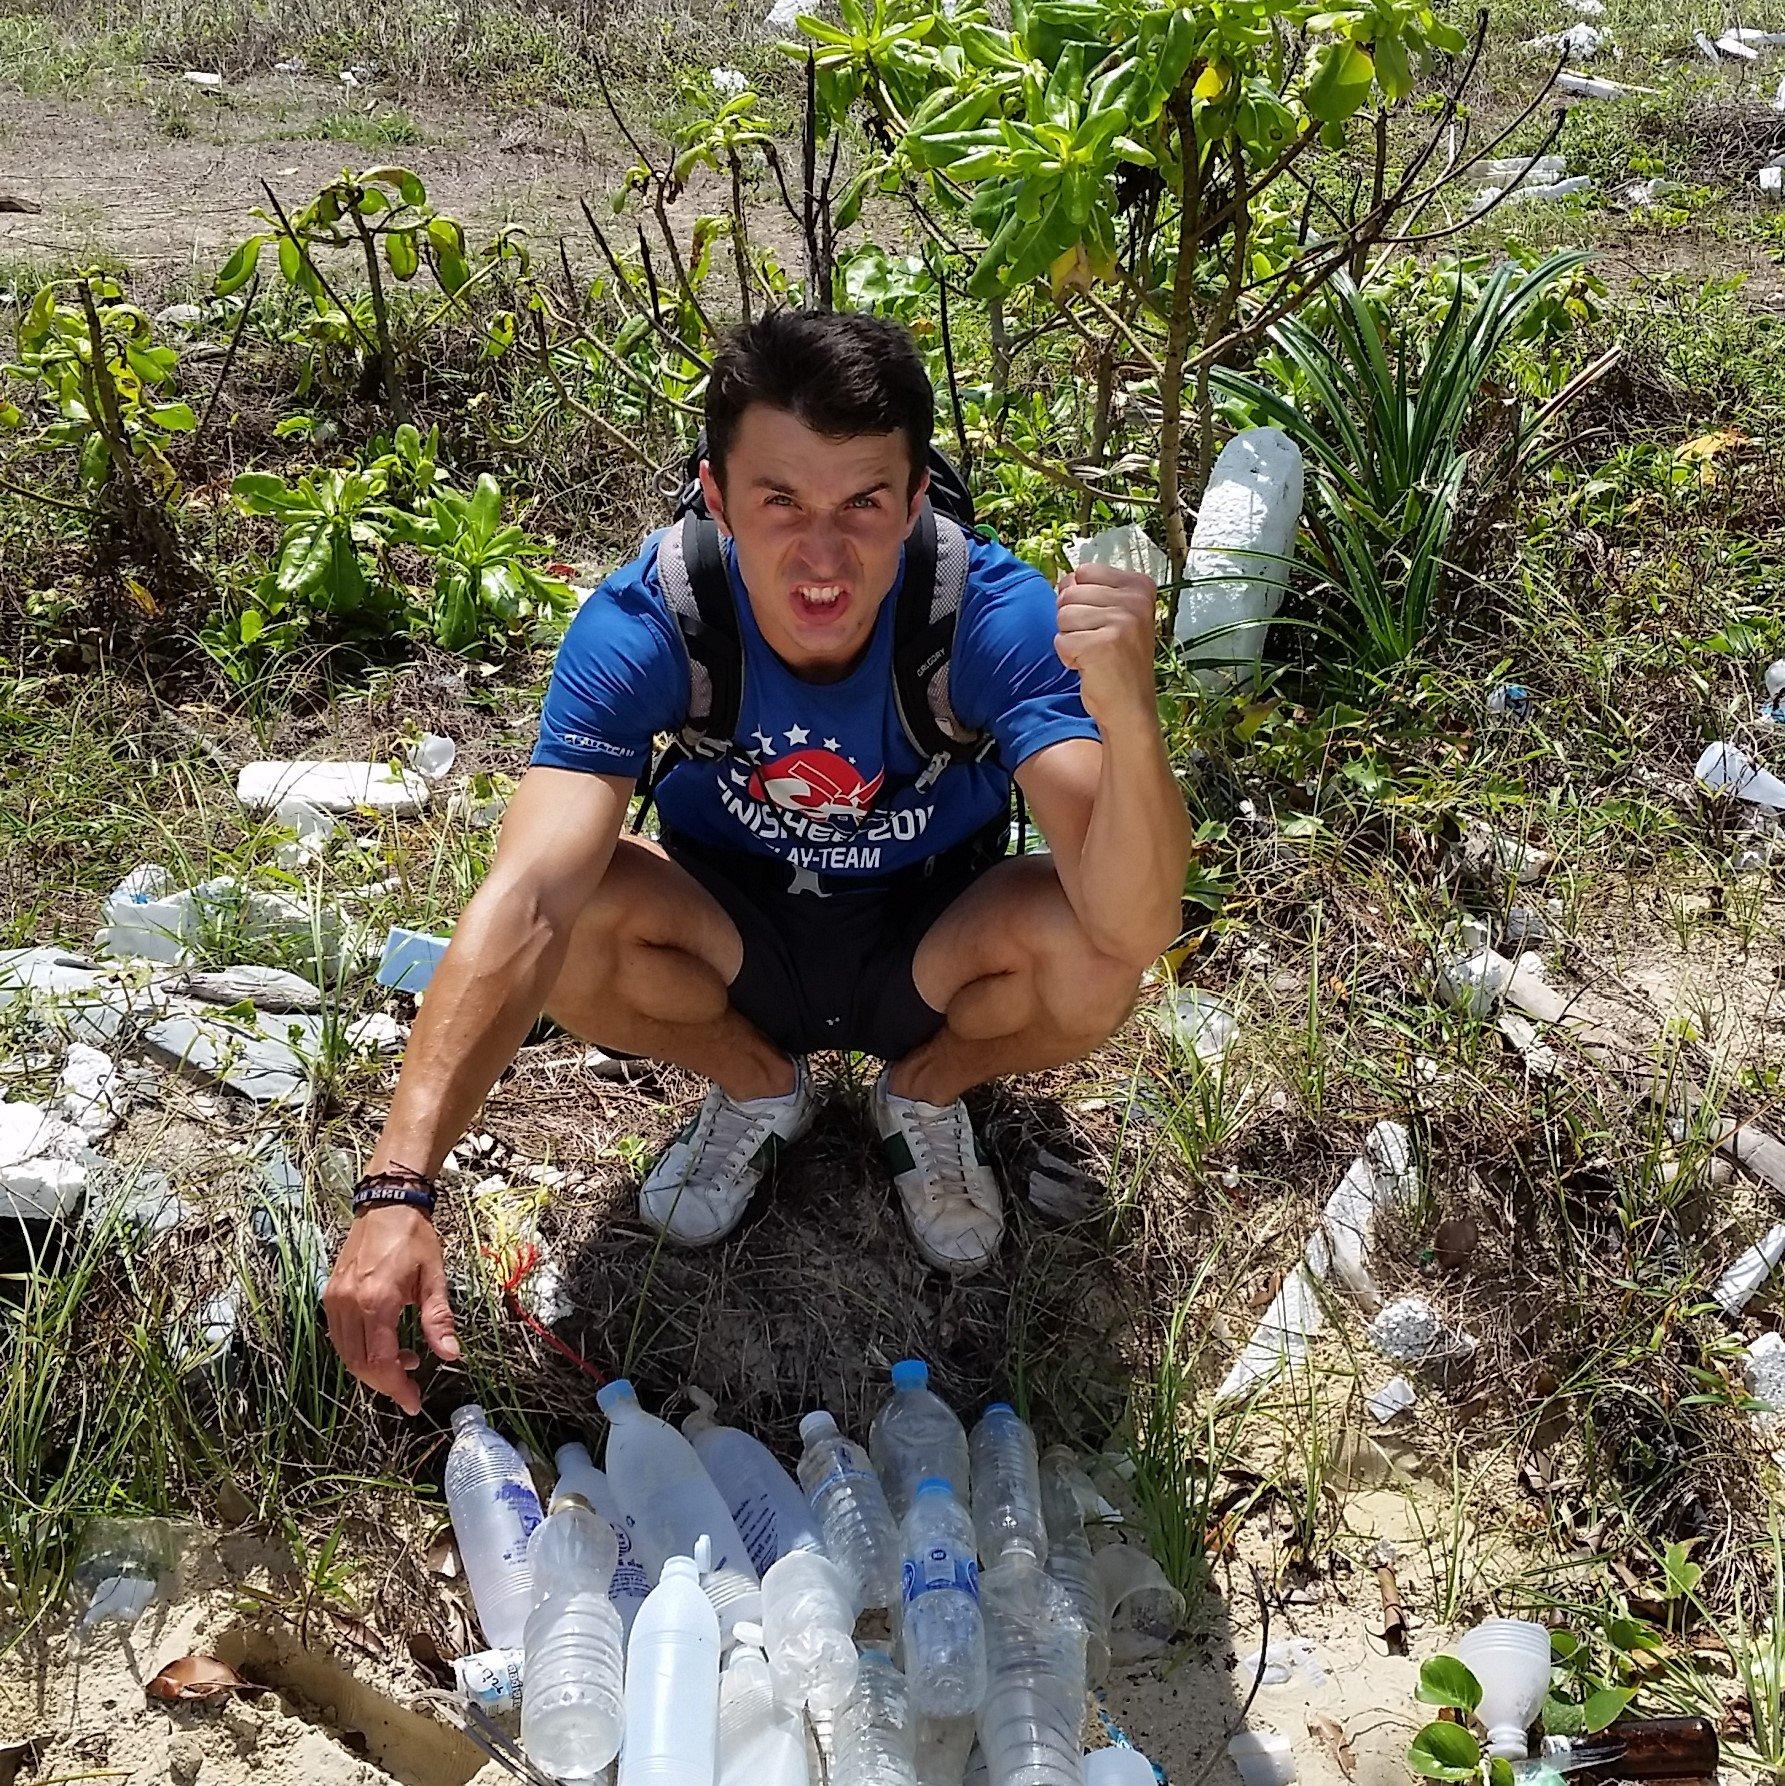 Flo-Bro   Burn Plastics for a Better Environment   Flo-Bro